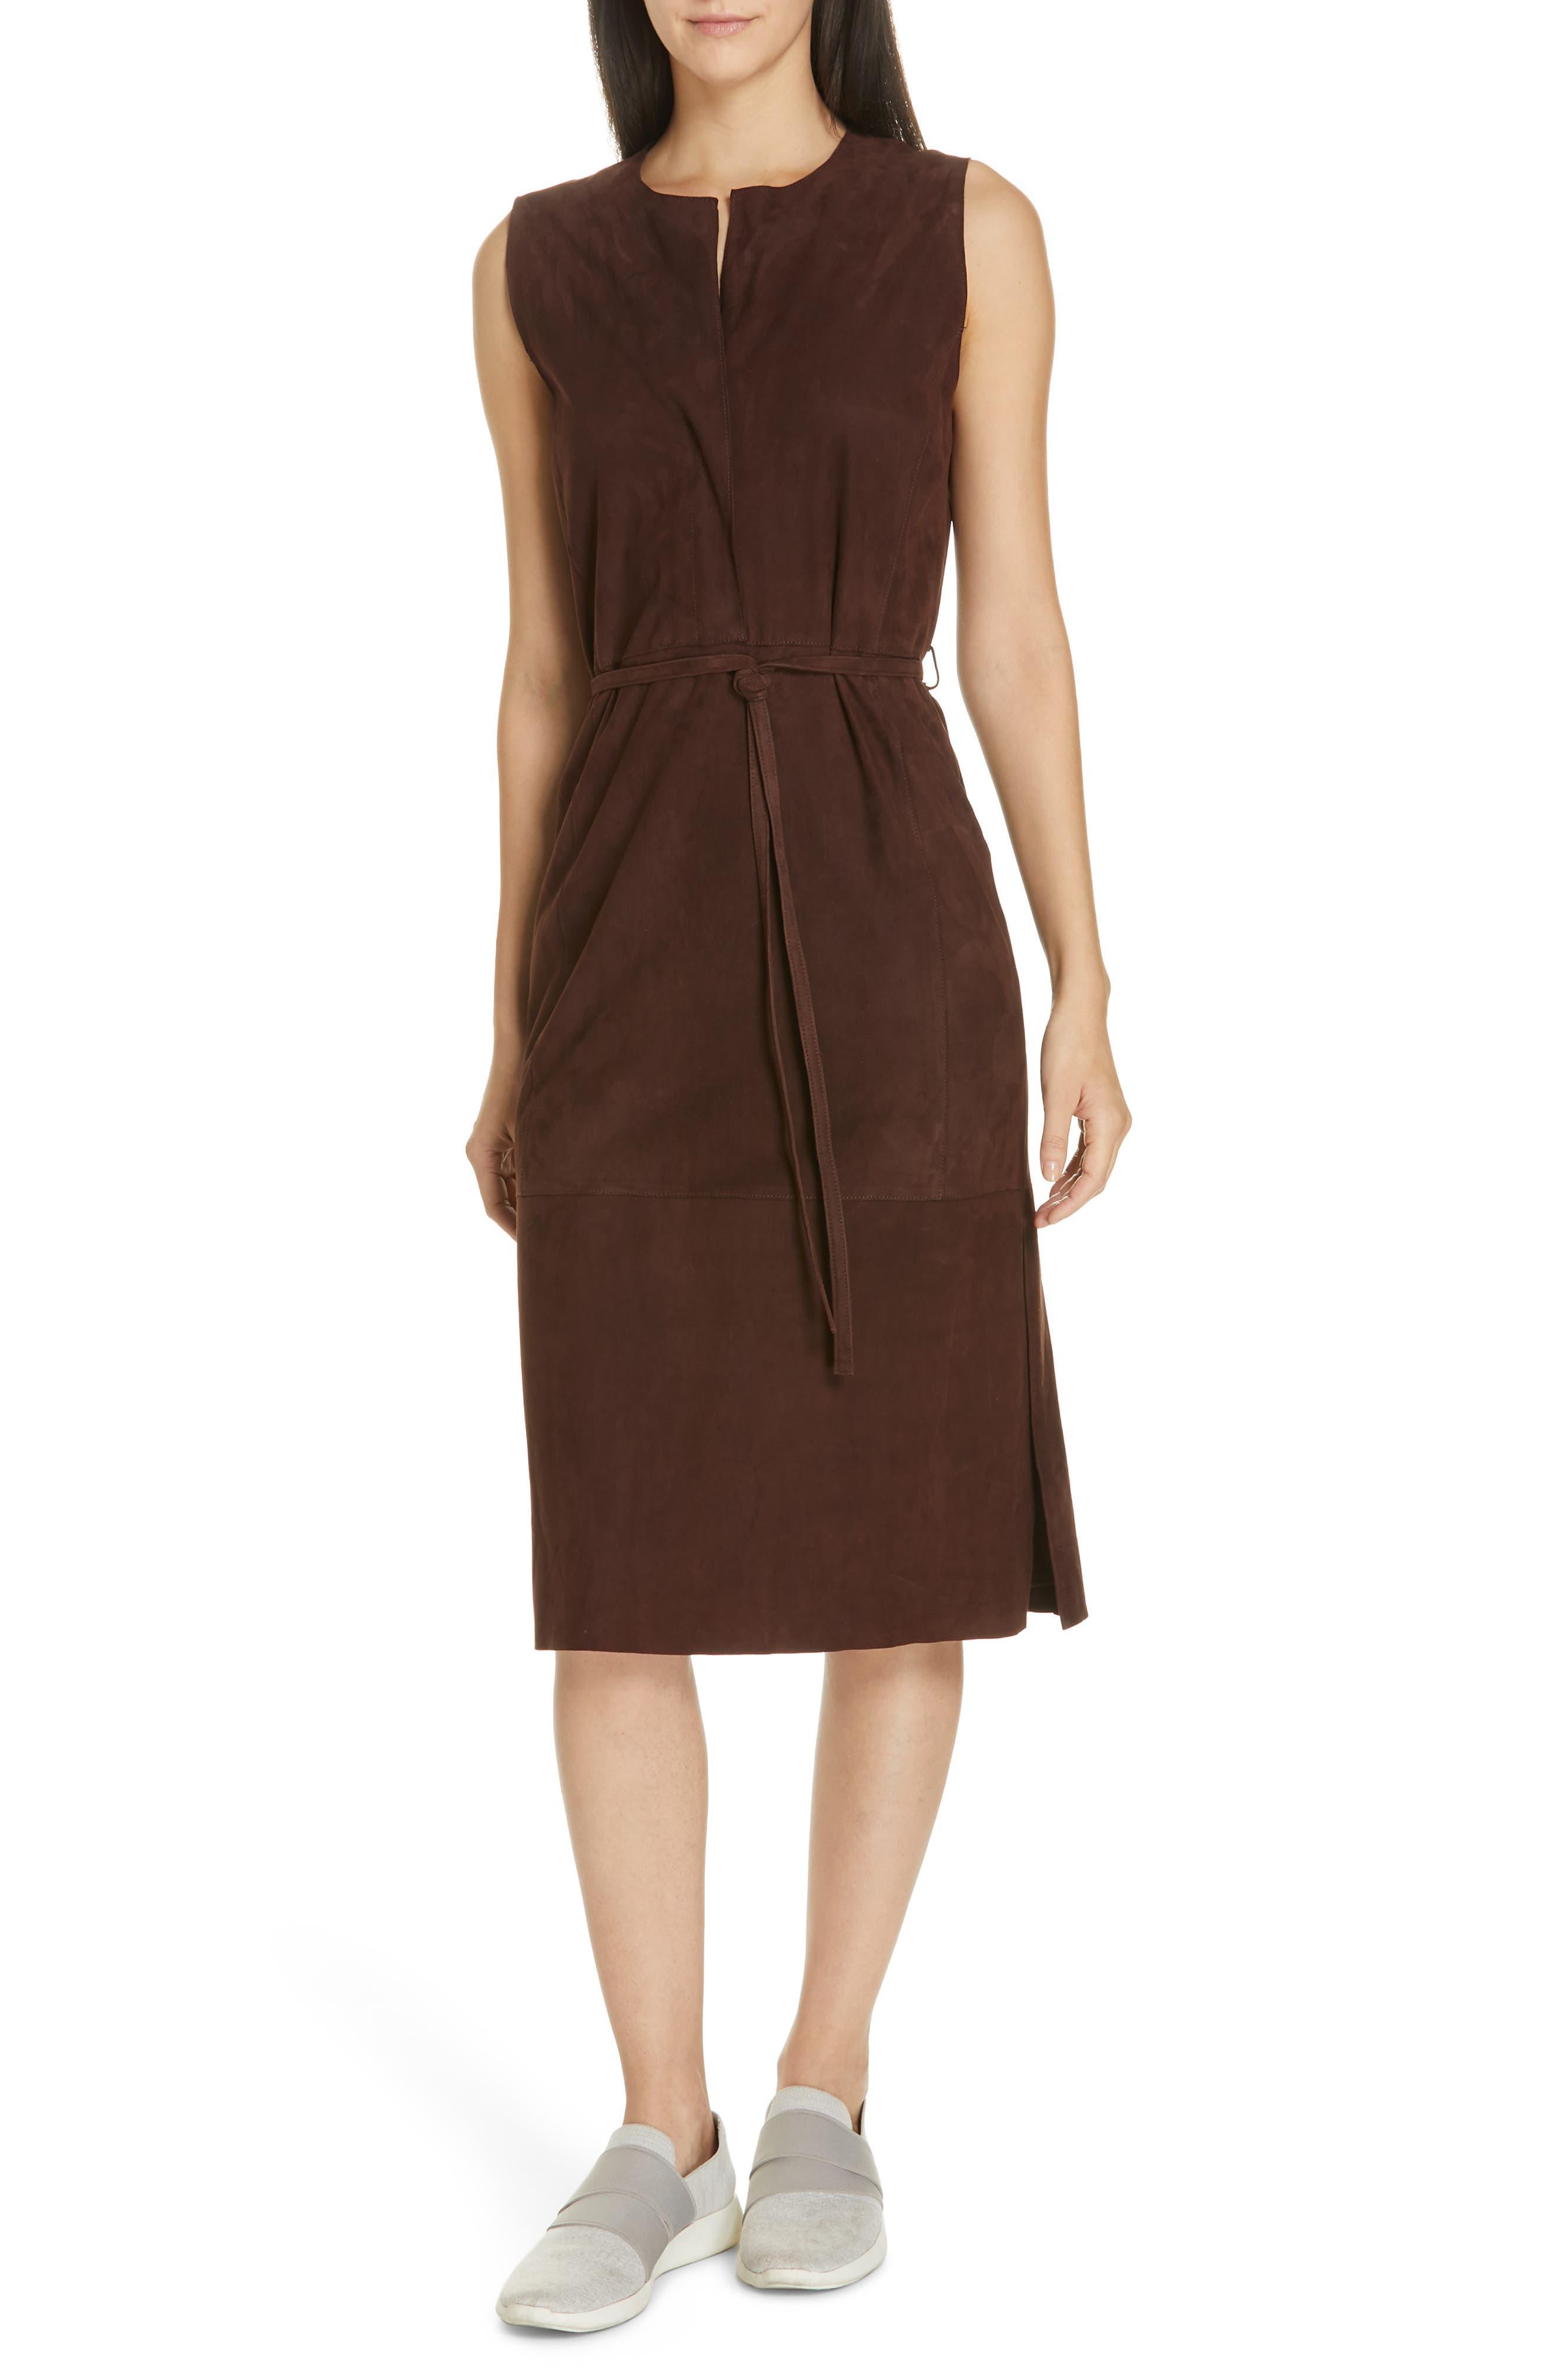 Belted Suede Sleeveless Midi Dress in Black Truffle